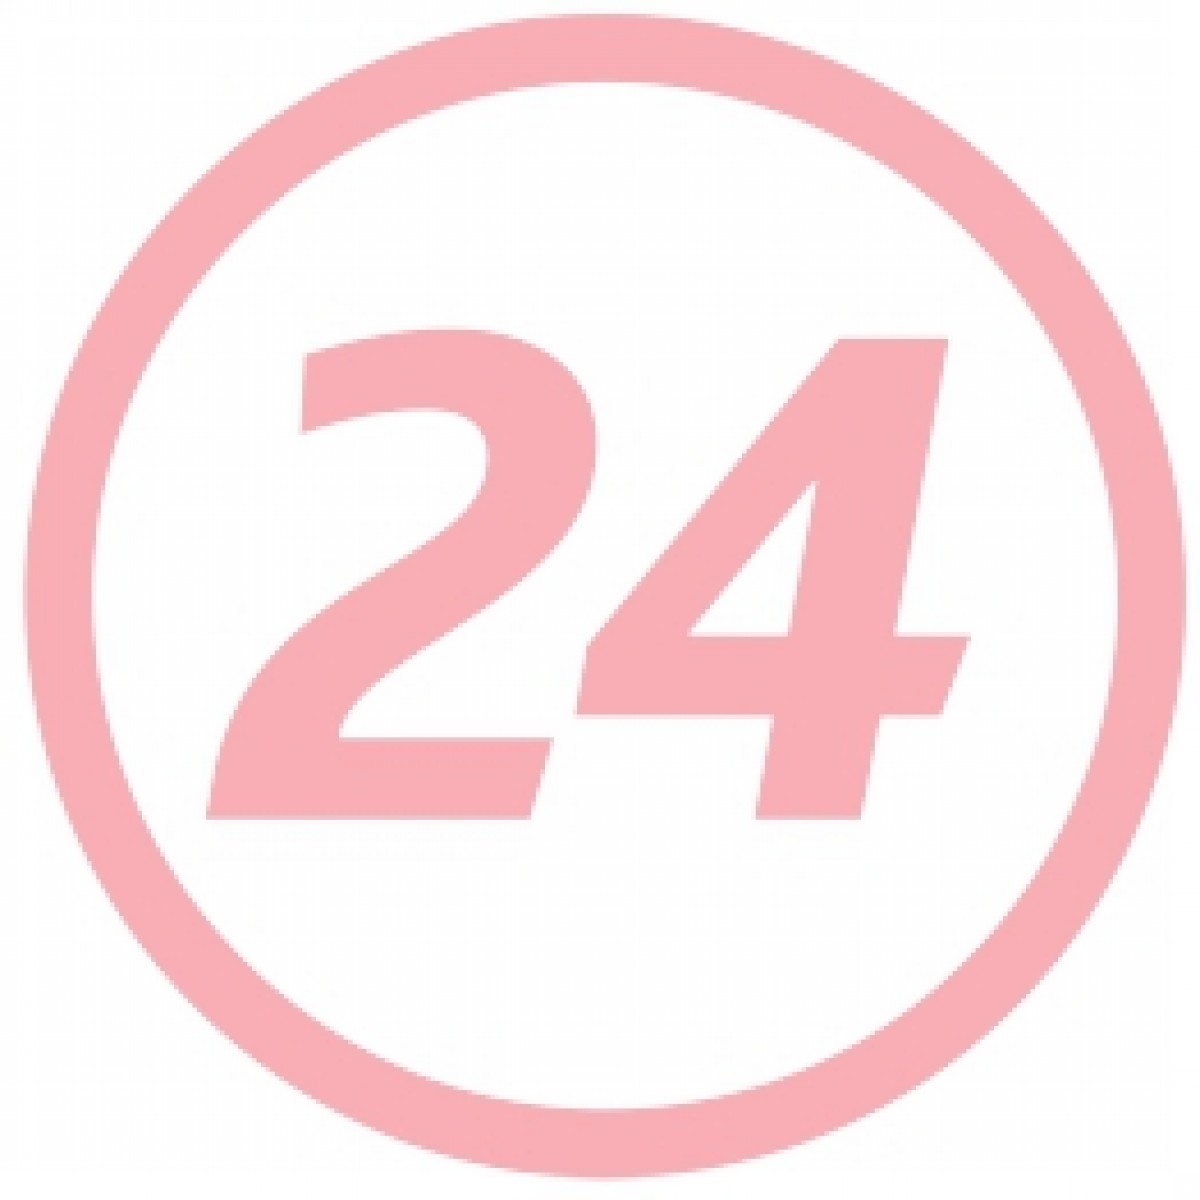 Gerovital H3 Derma+ Apa Micelara, Apa Micelara, 150ml